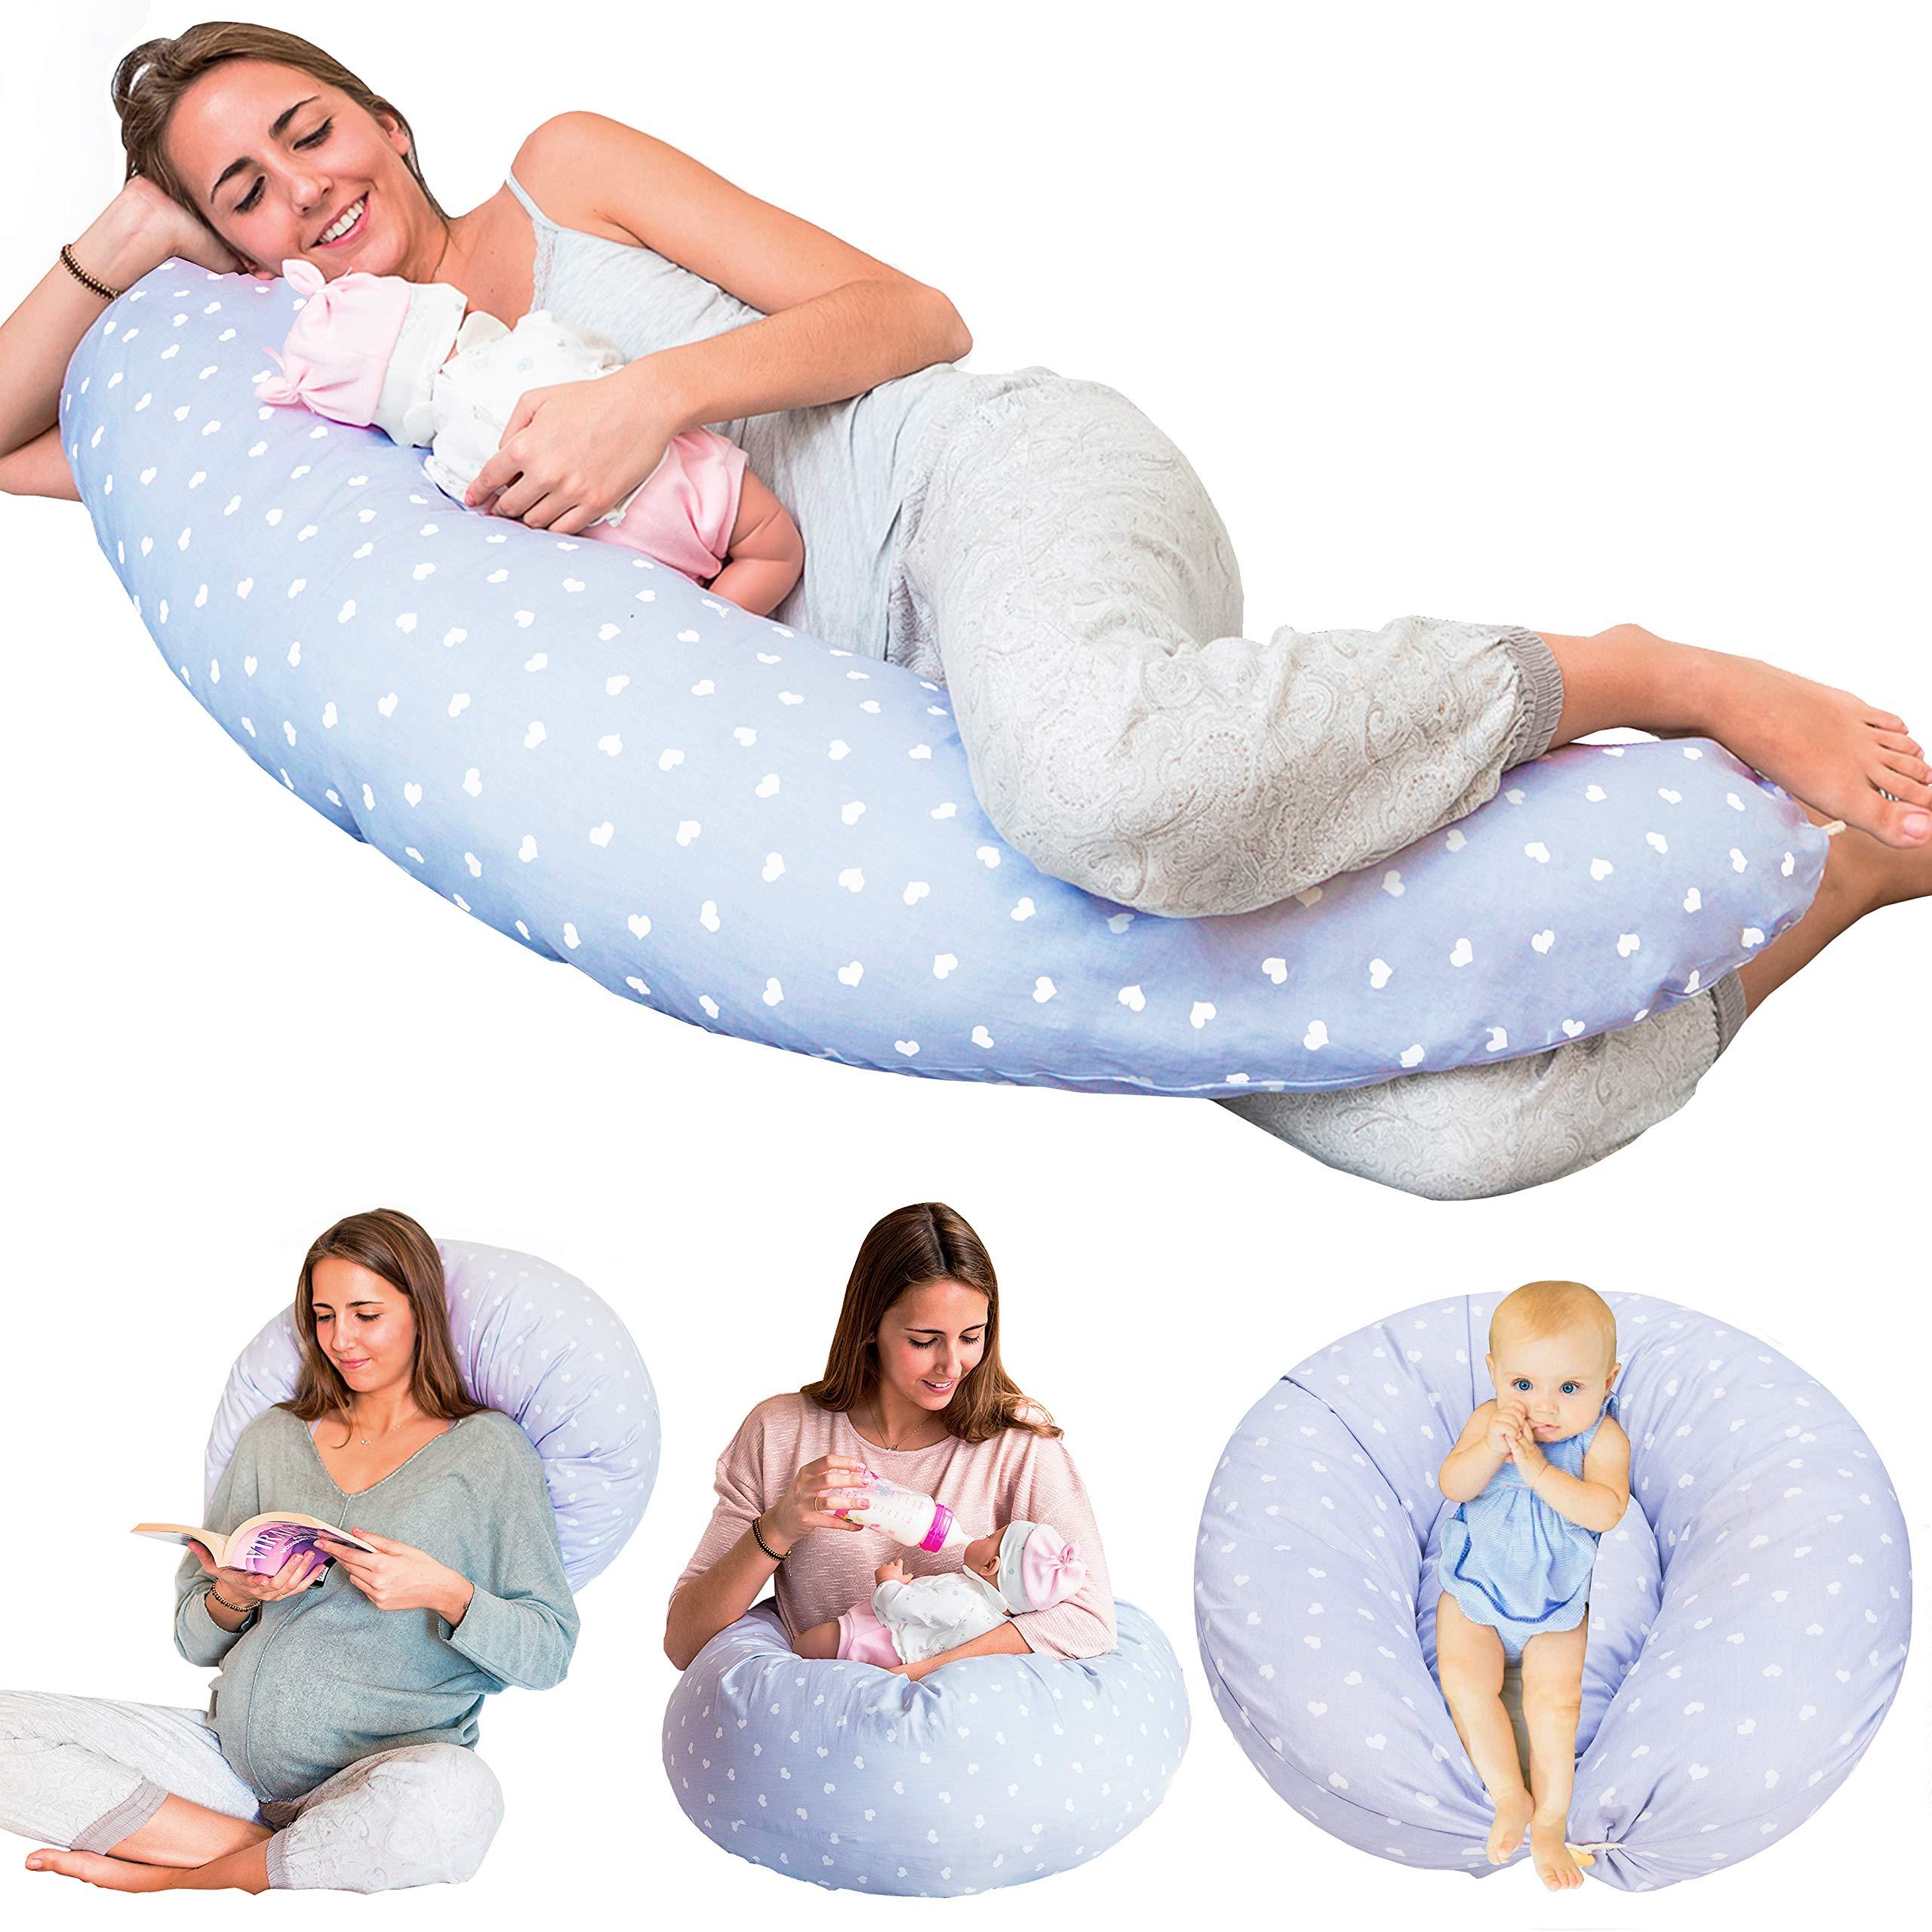 Bamibi Multifunctional Pregnancy Pillow & Breastfeeding Pillow + Inner Cushion. Cover 100% Cotton, Filling 100% Polyester, Baby Nest, Nursing Pillow, Maternity Pillow by Bamibi